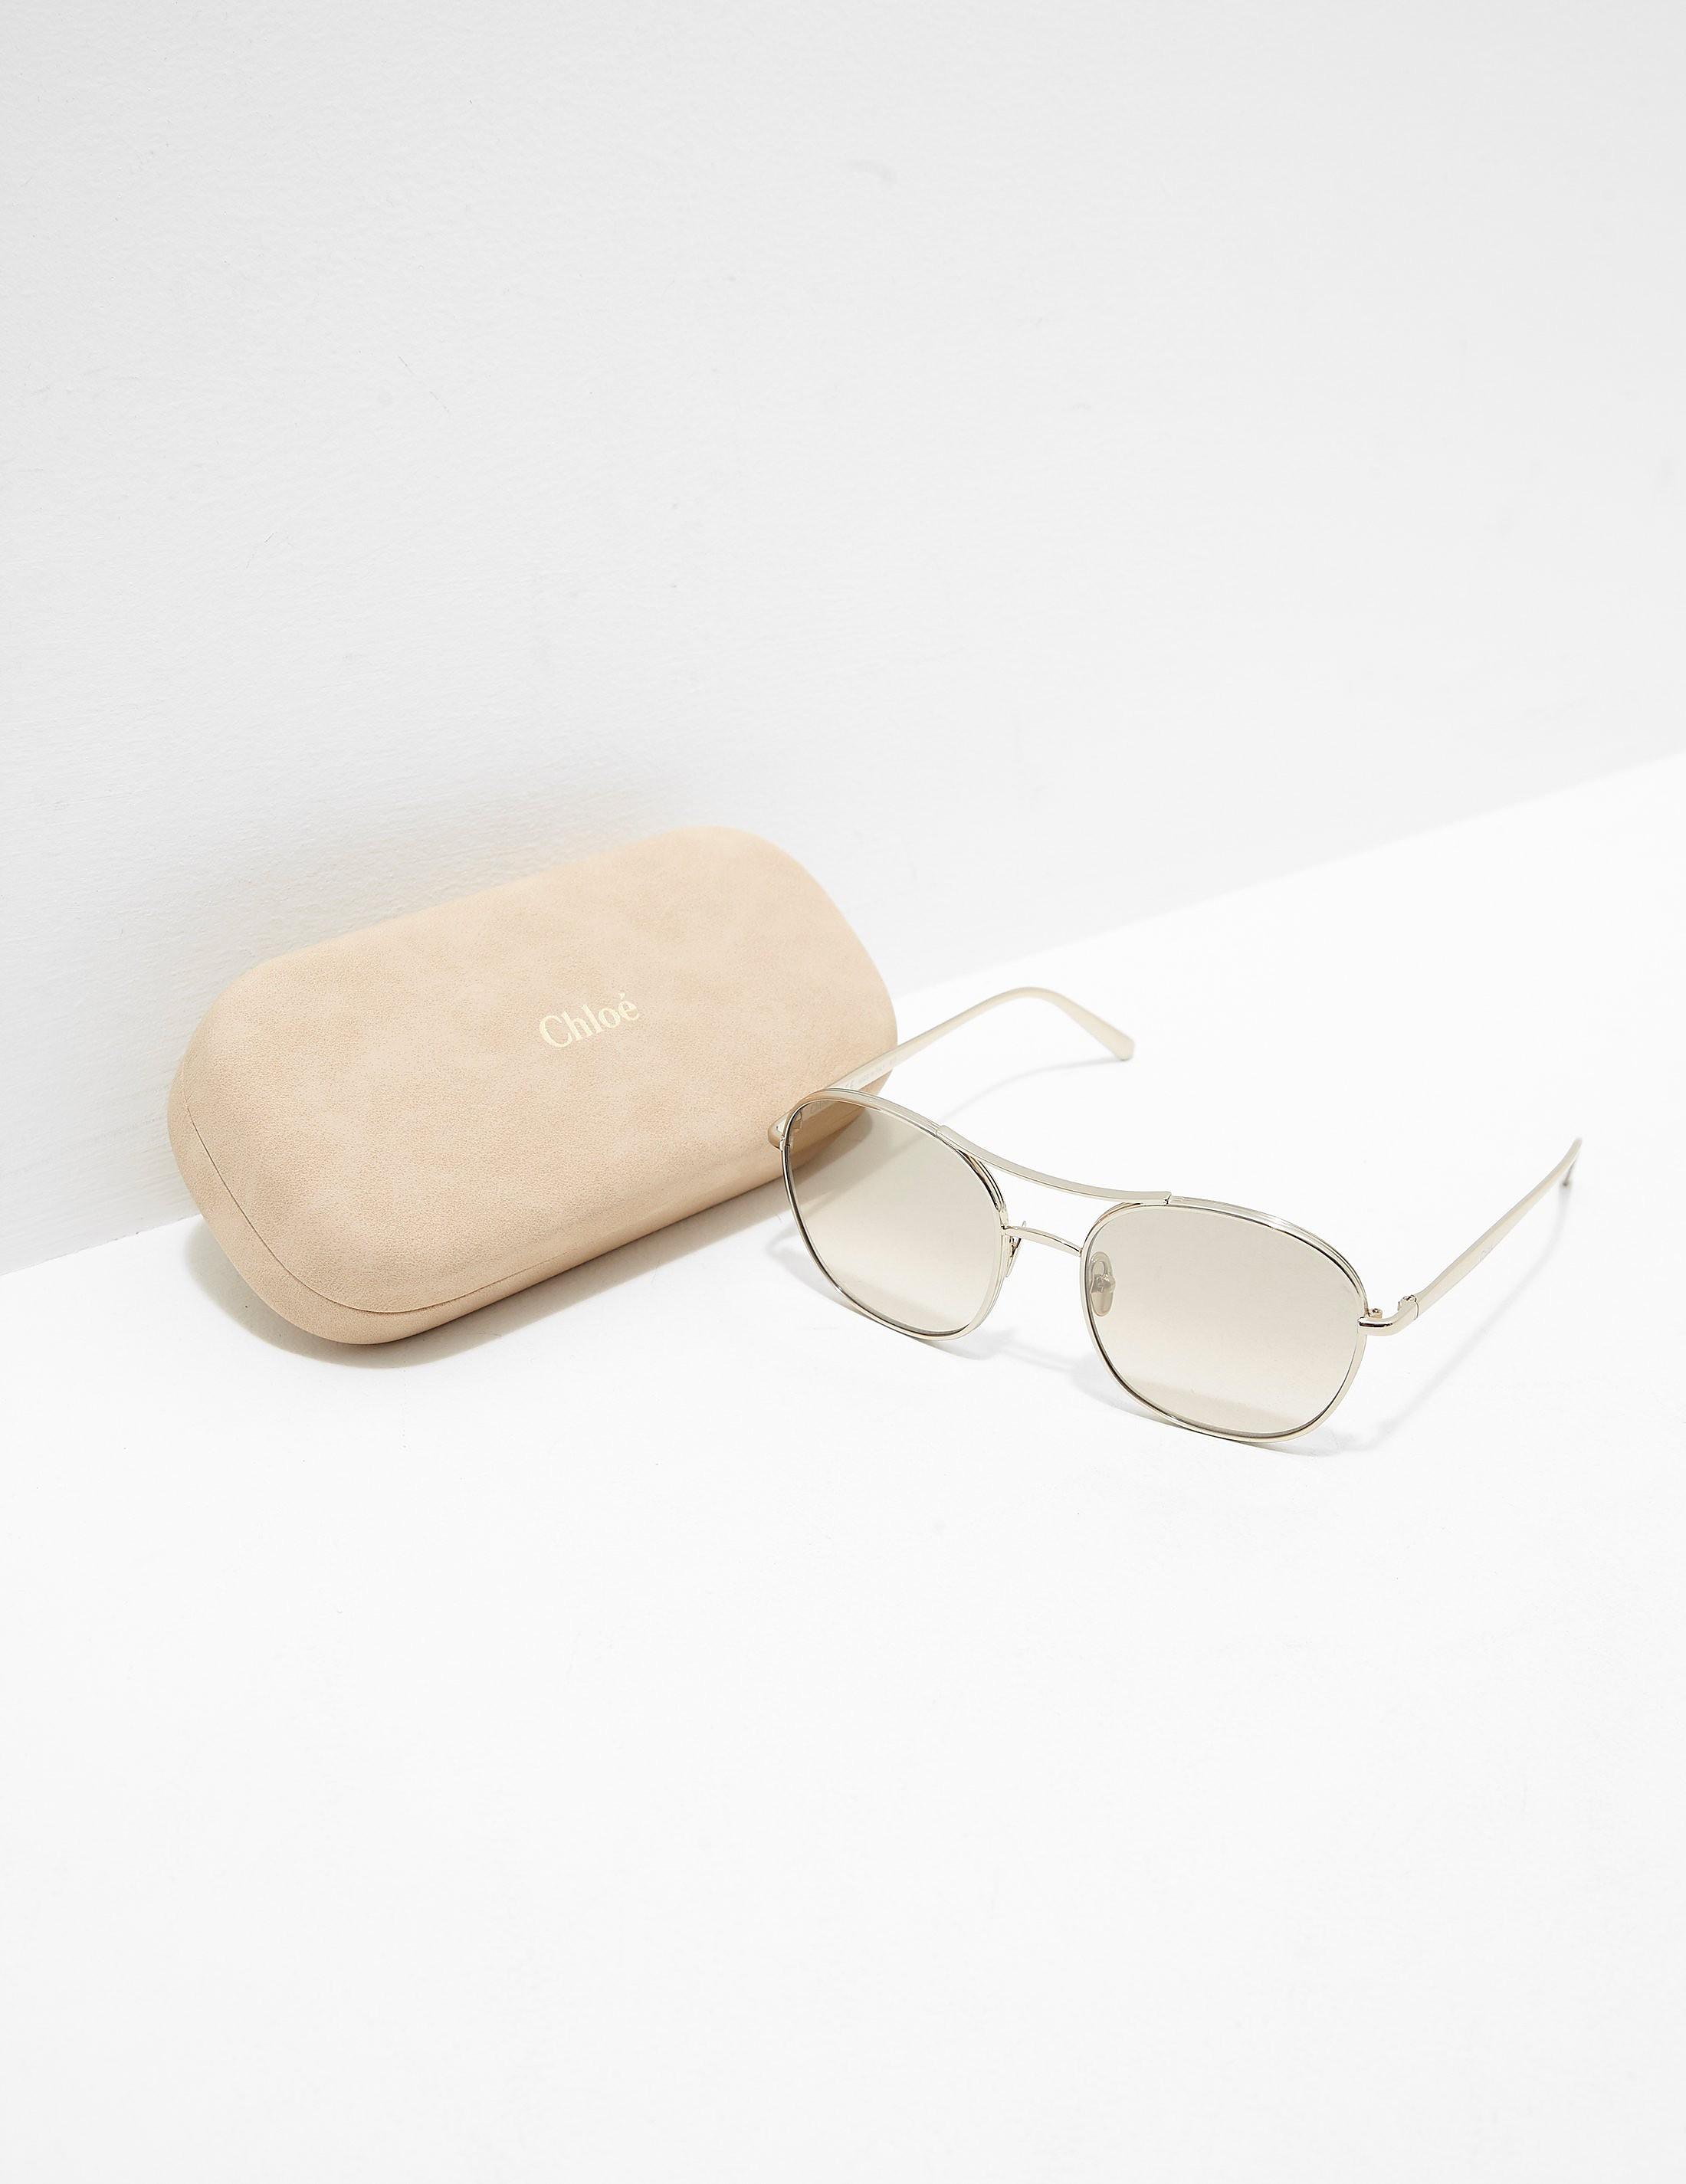 Chloe Metal Sunglasses - Online Exclusive